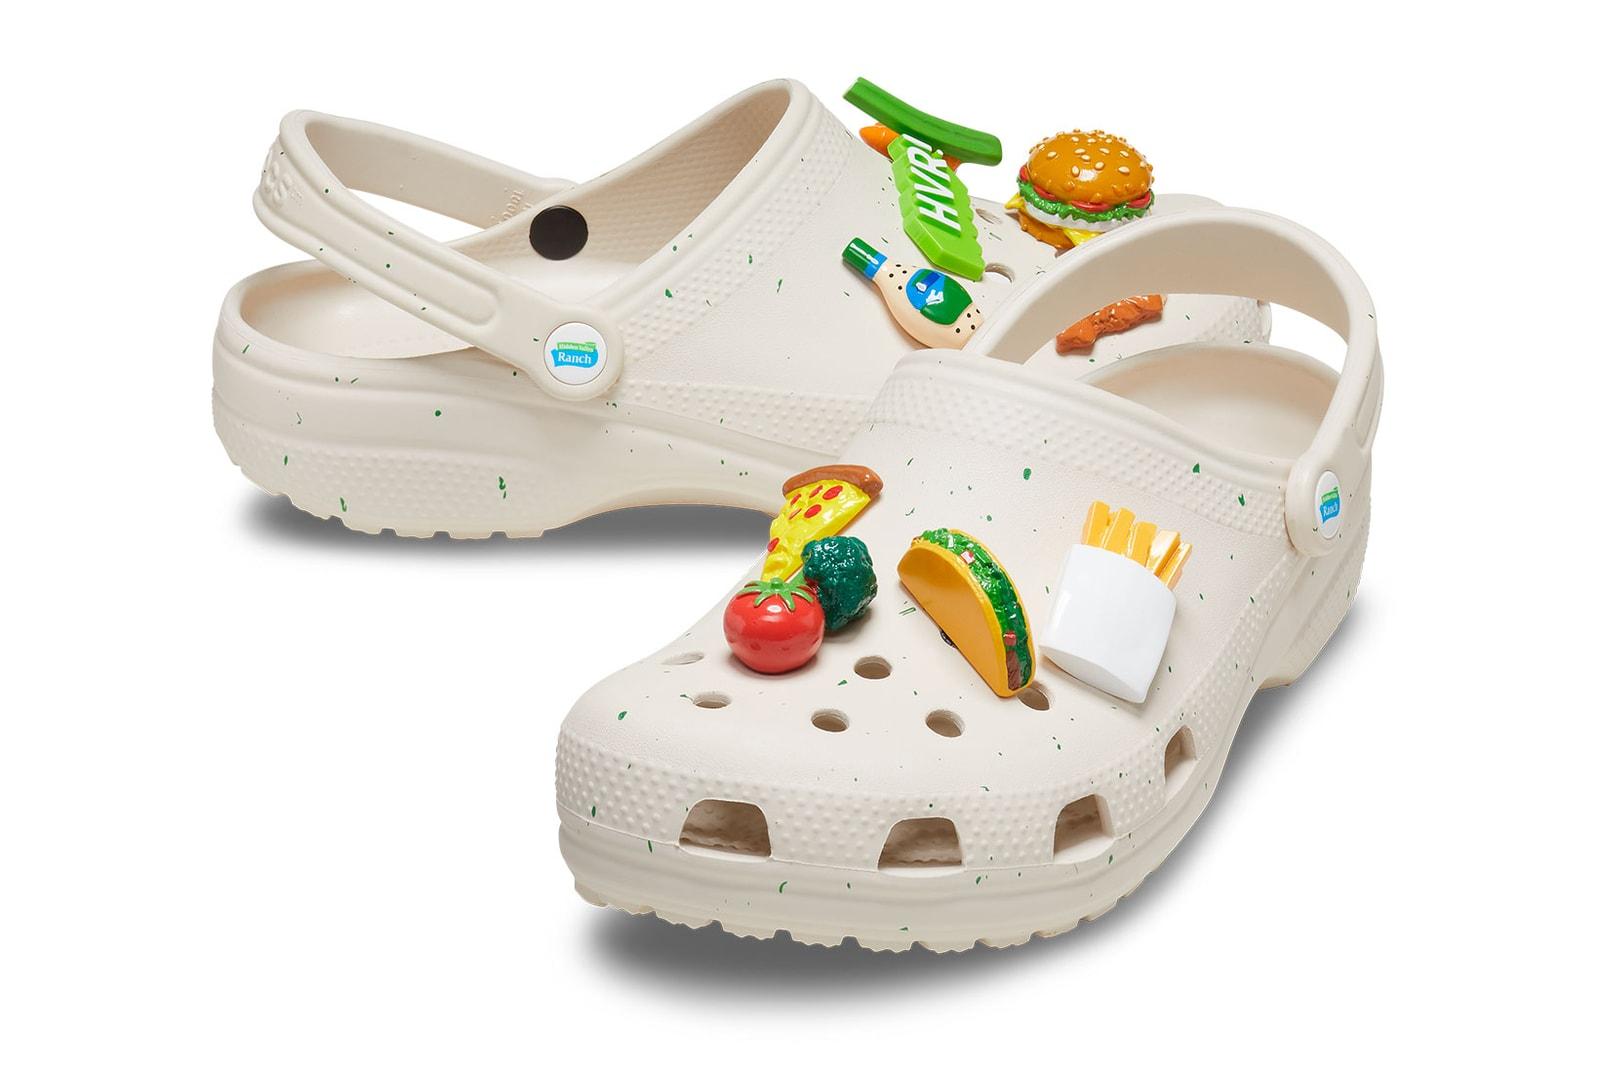 Crocs Hidden Valley Ranch Saweetie Clogs Jibbitz Pizza Fries Release Where to buy